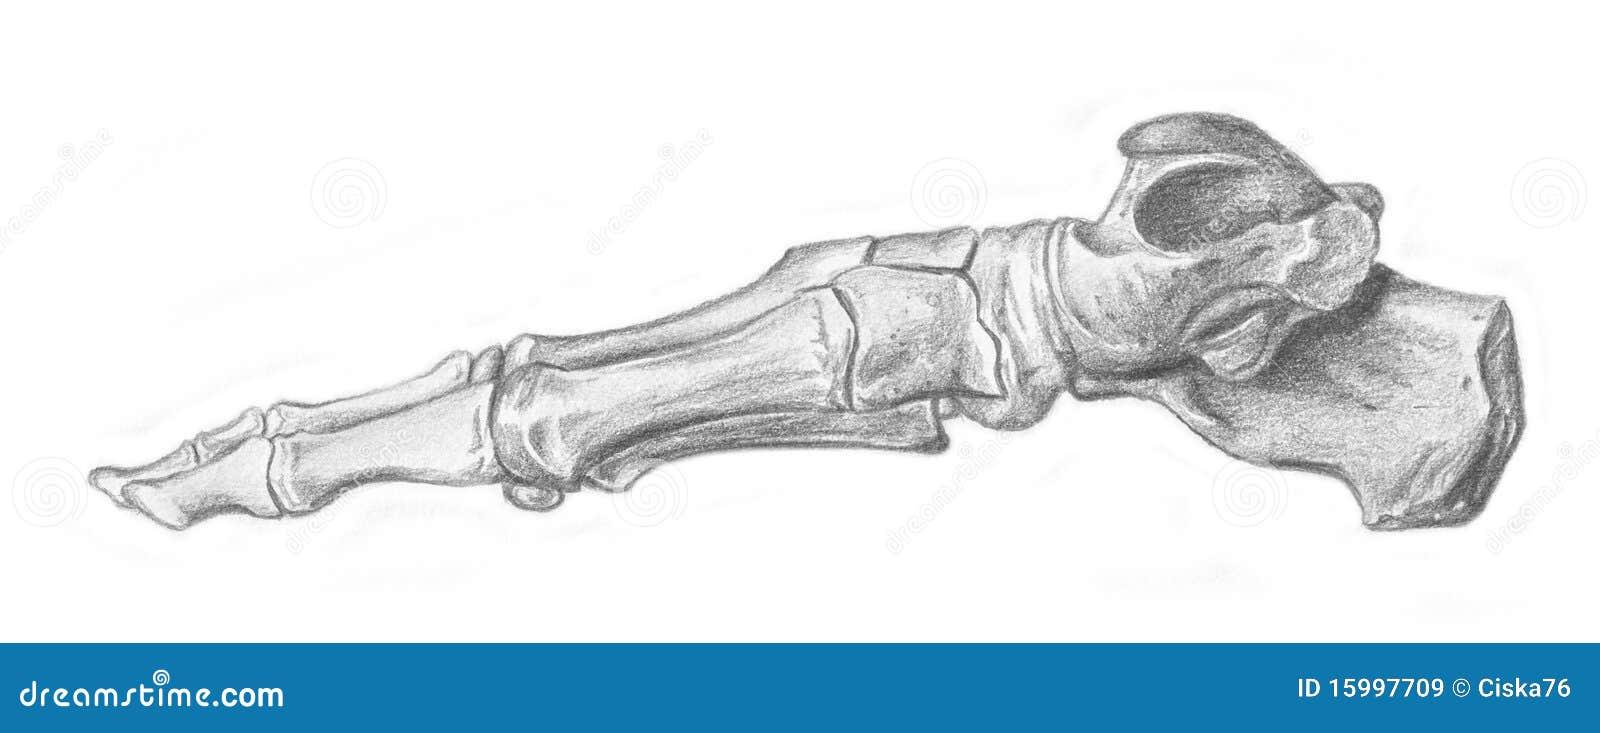 Fuß - Skelett stock abbildung. Illustration von ikone - 15997709